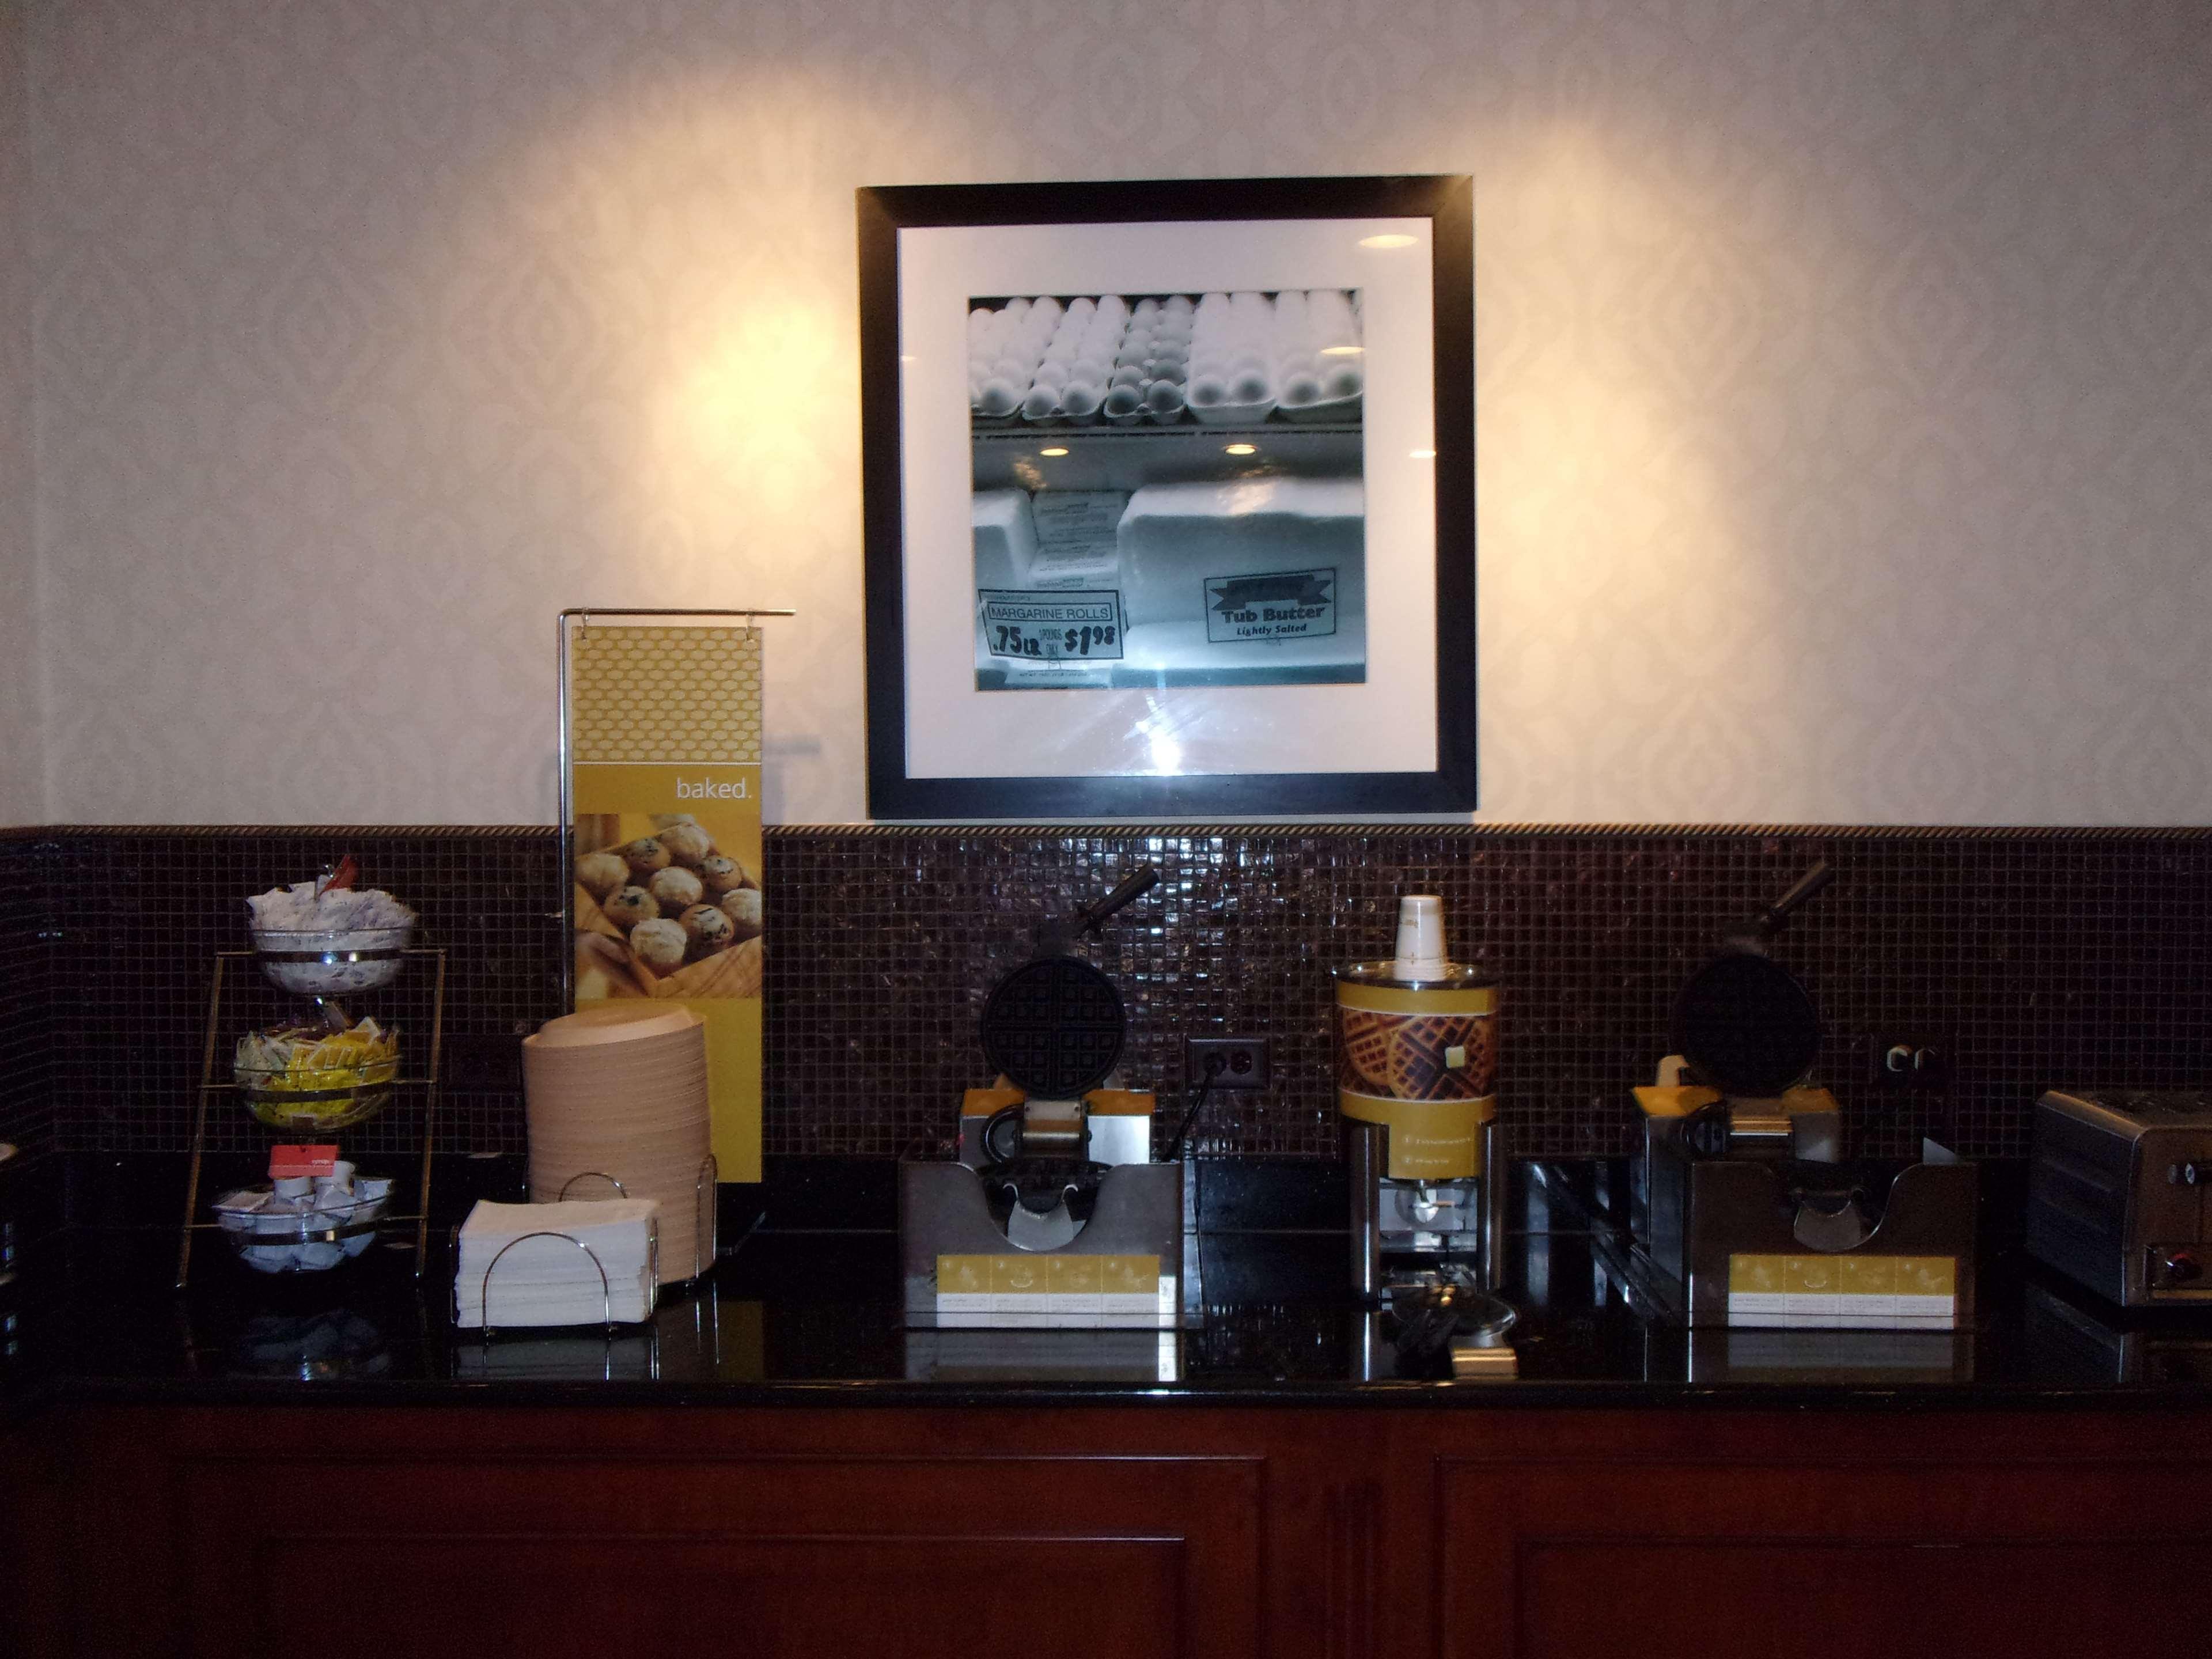 Hampton Inn & Suites Bolingbrook image 22